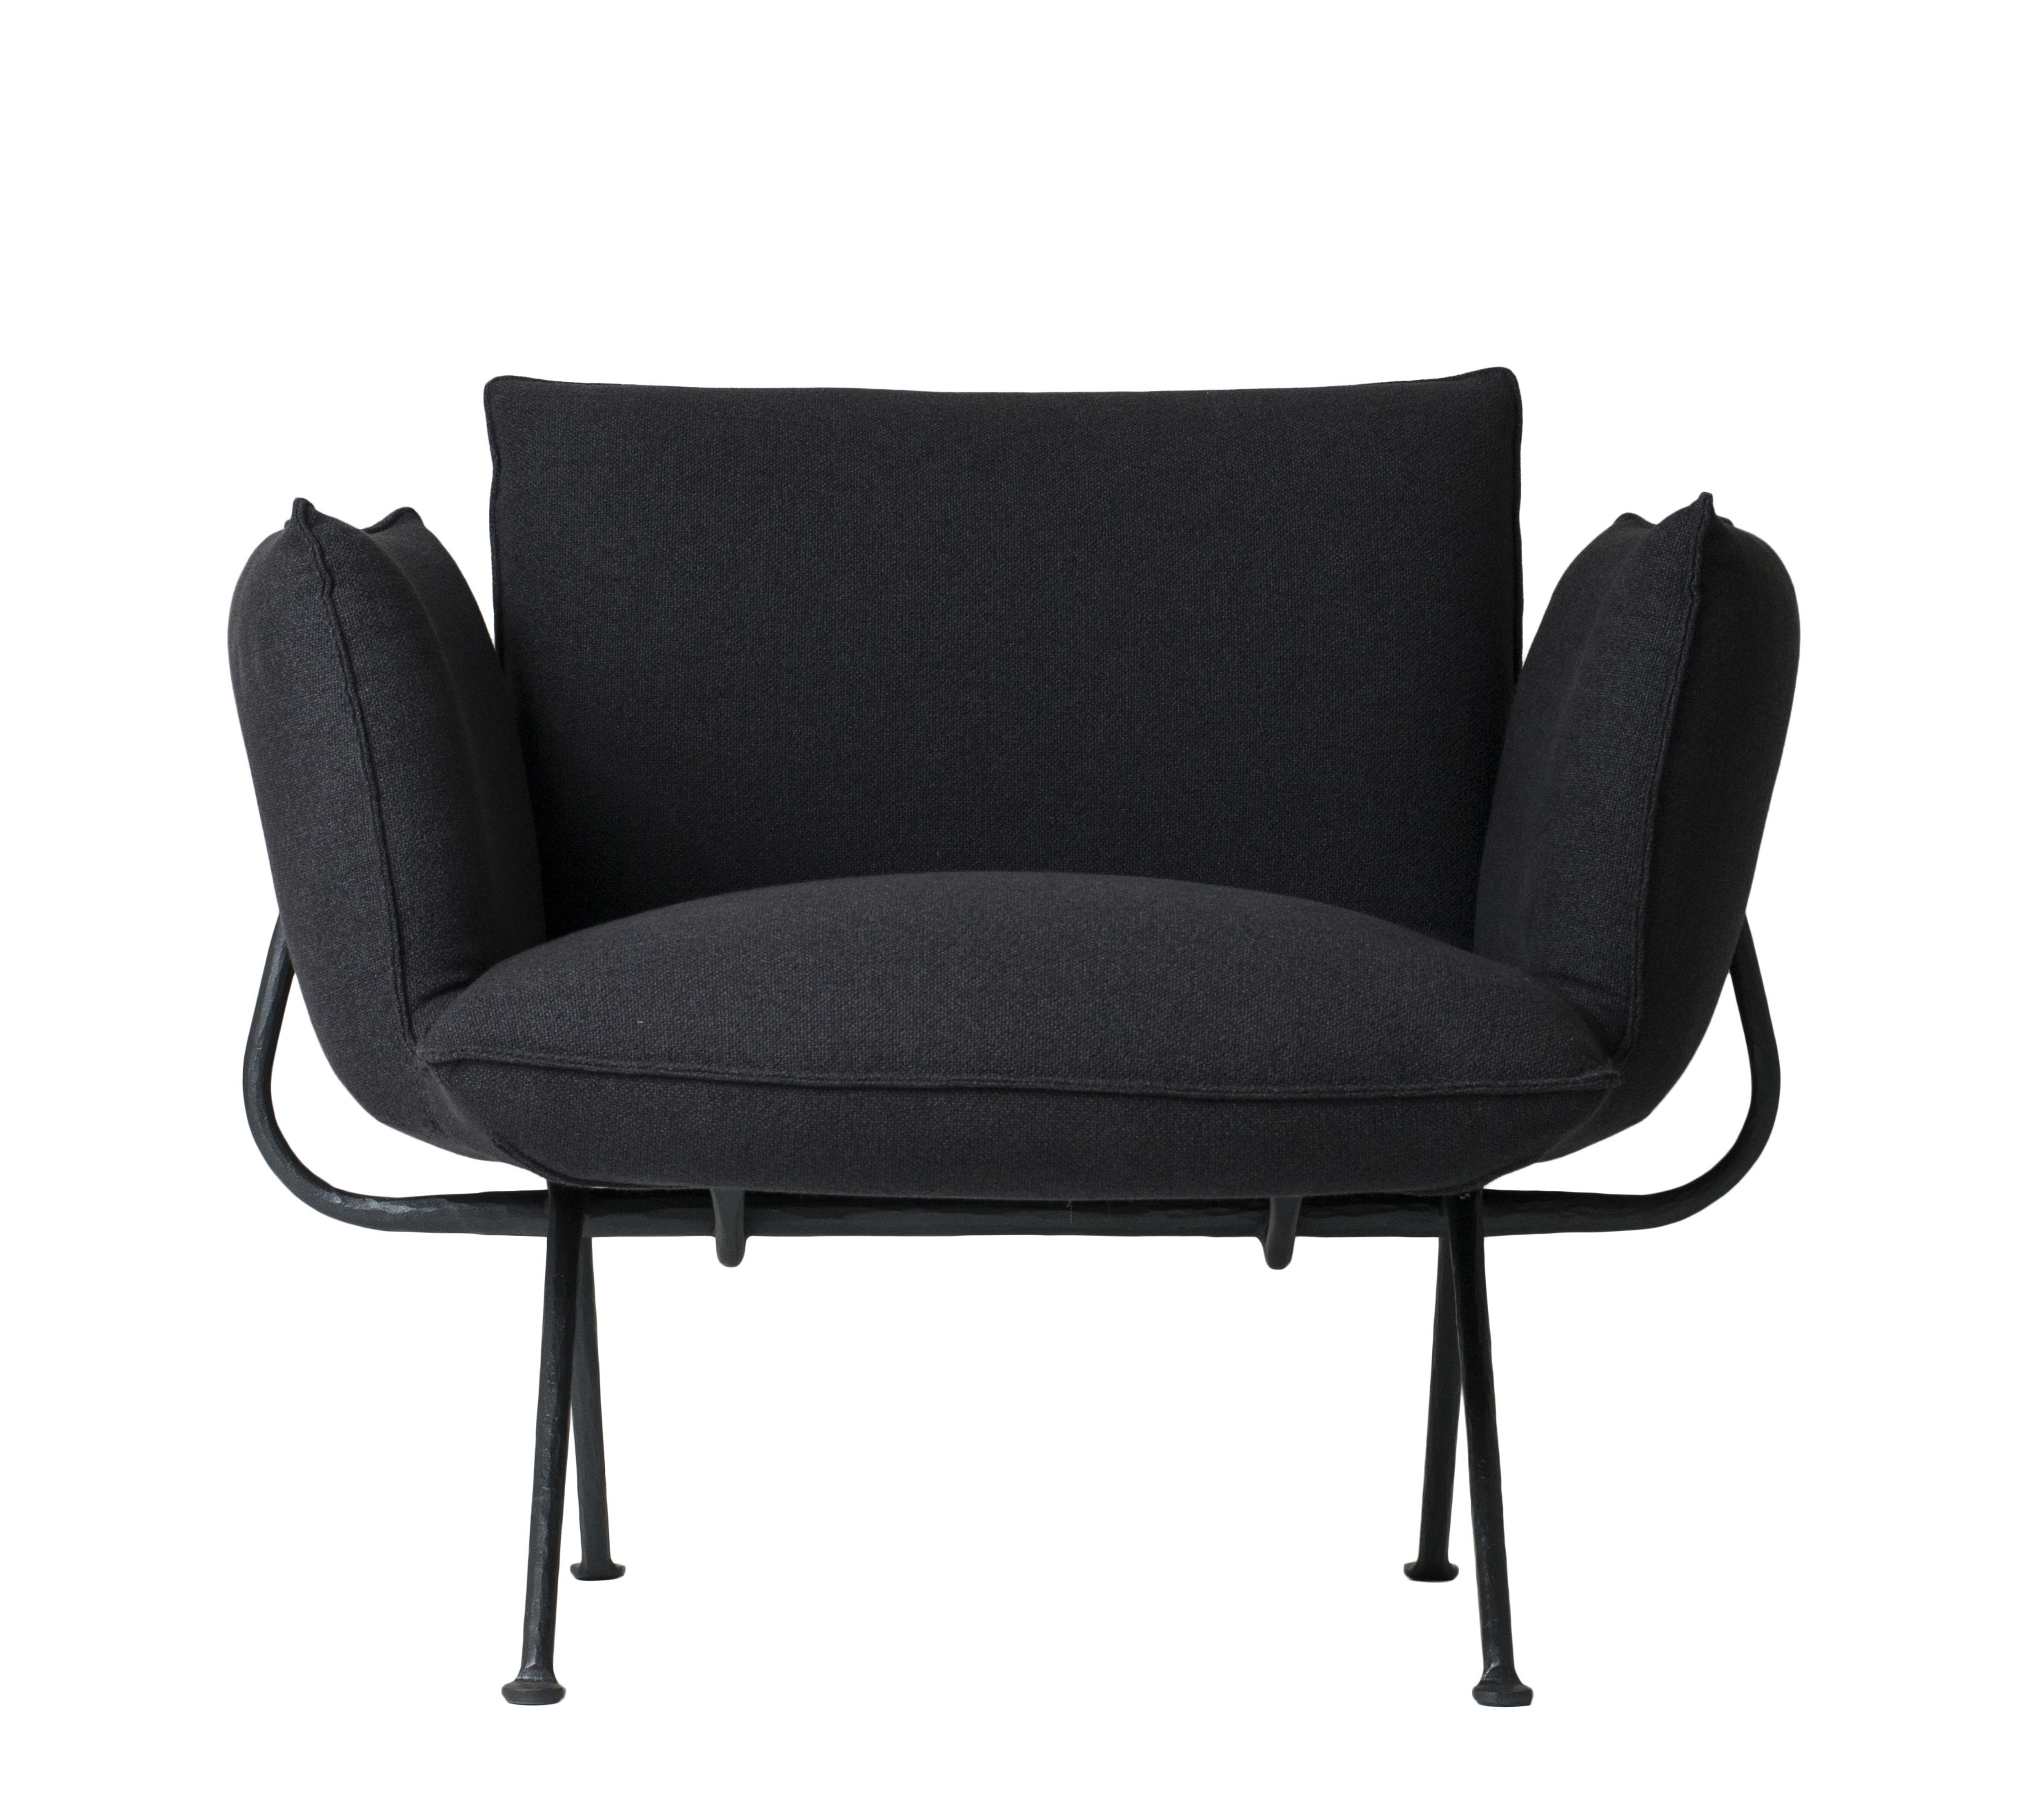 Möbel - Lounge Sessel - Officina Gepolsterter Sessel / Stoffbezug - Magis - Bezug dunkelgrau / Gestell schwarz - Kvadrat-Gewebe, Lackiertes Schmiedeeisen